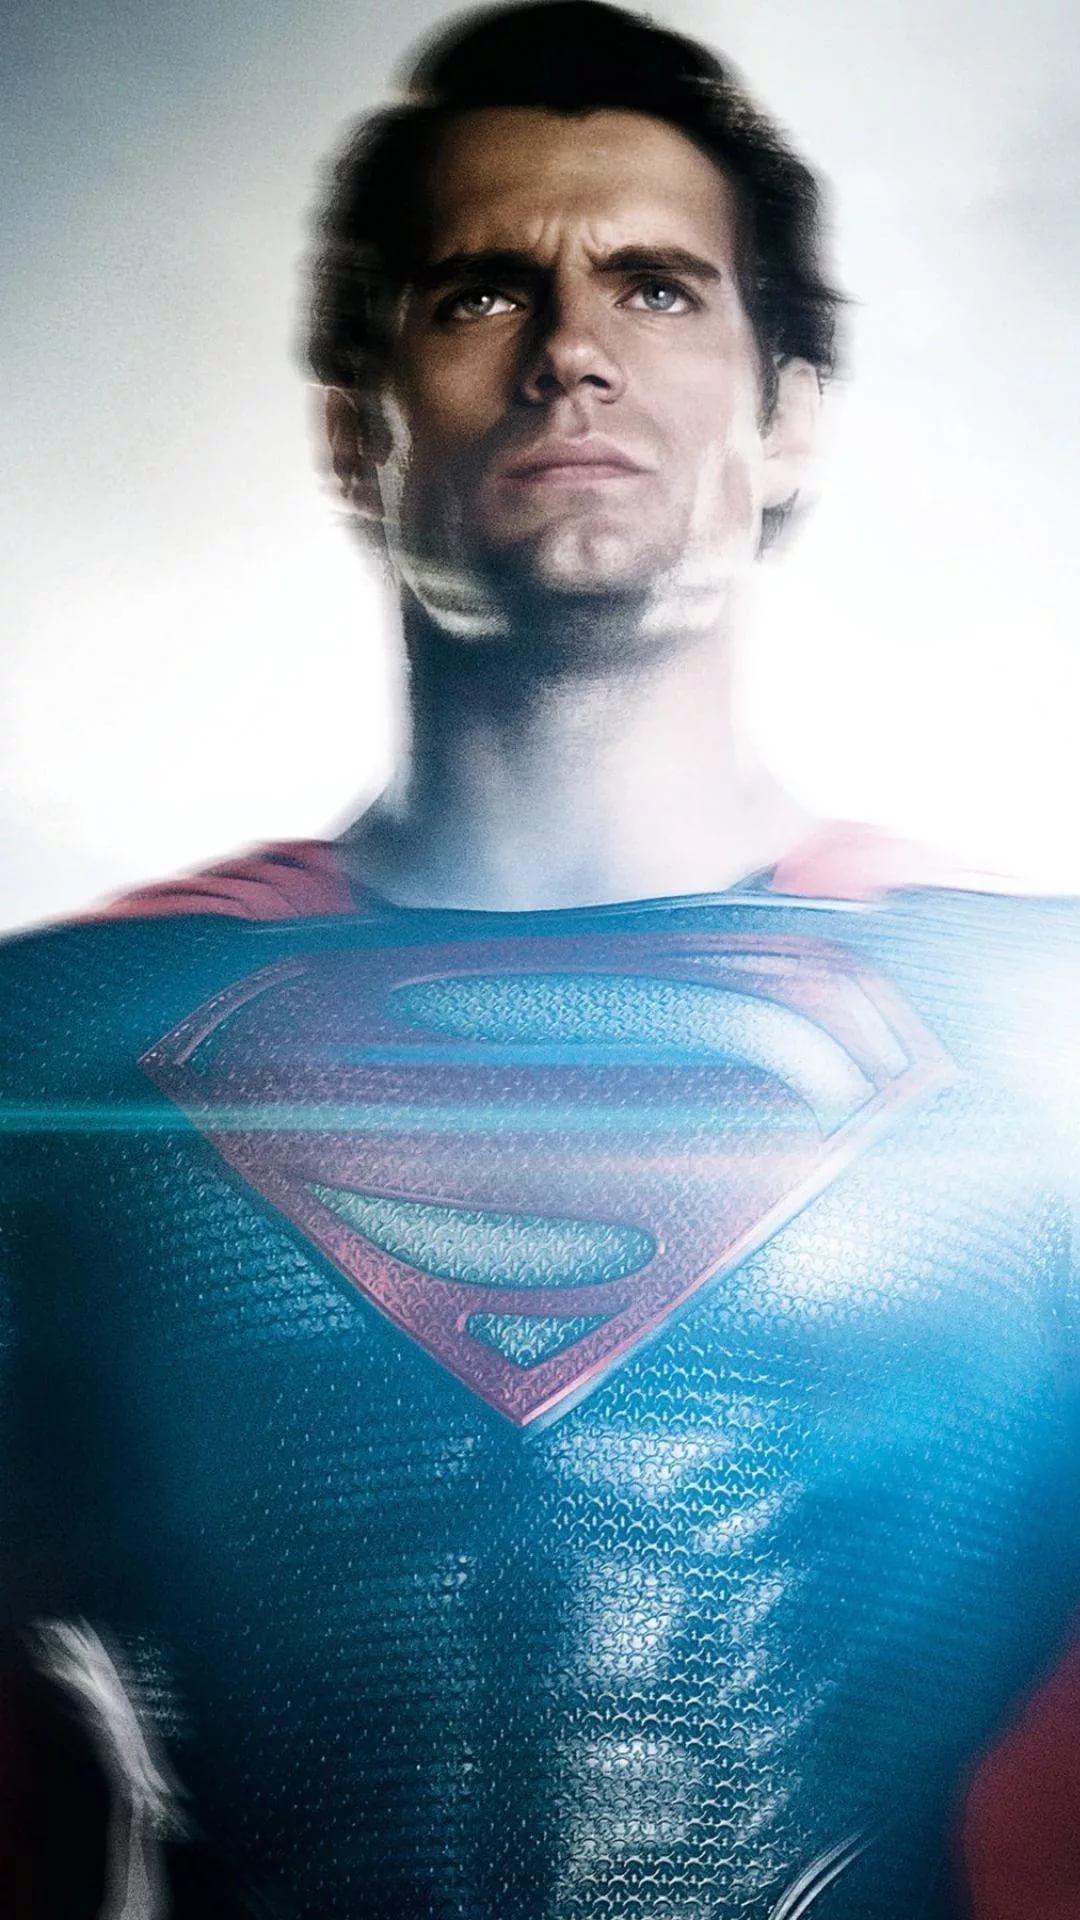 Superman iPhone x wallpaper hd